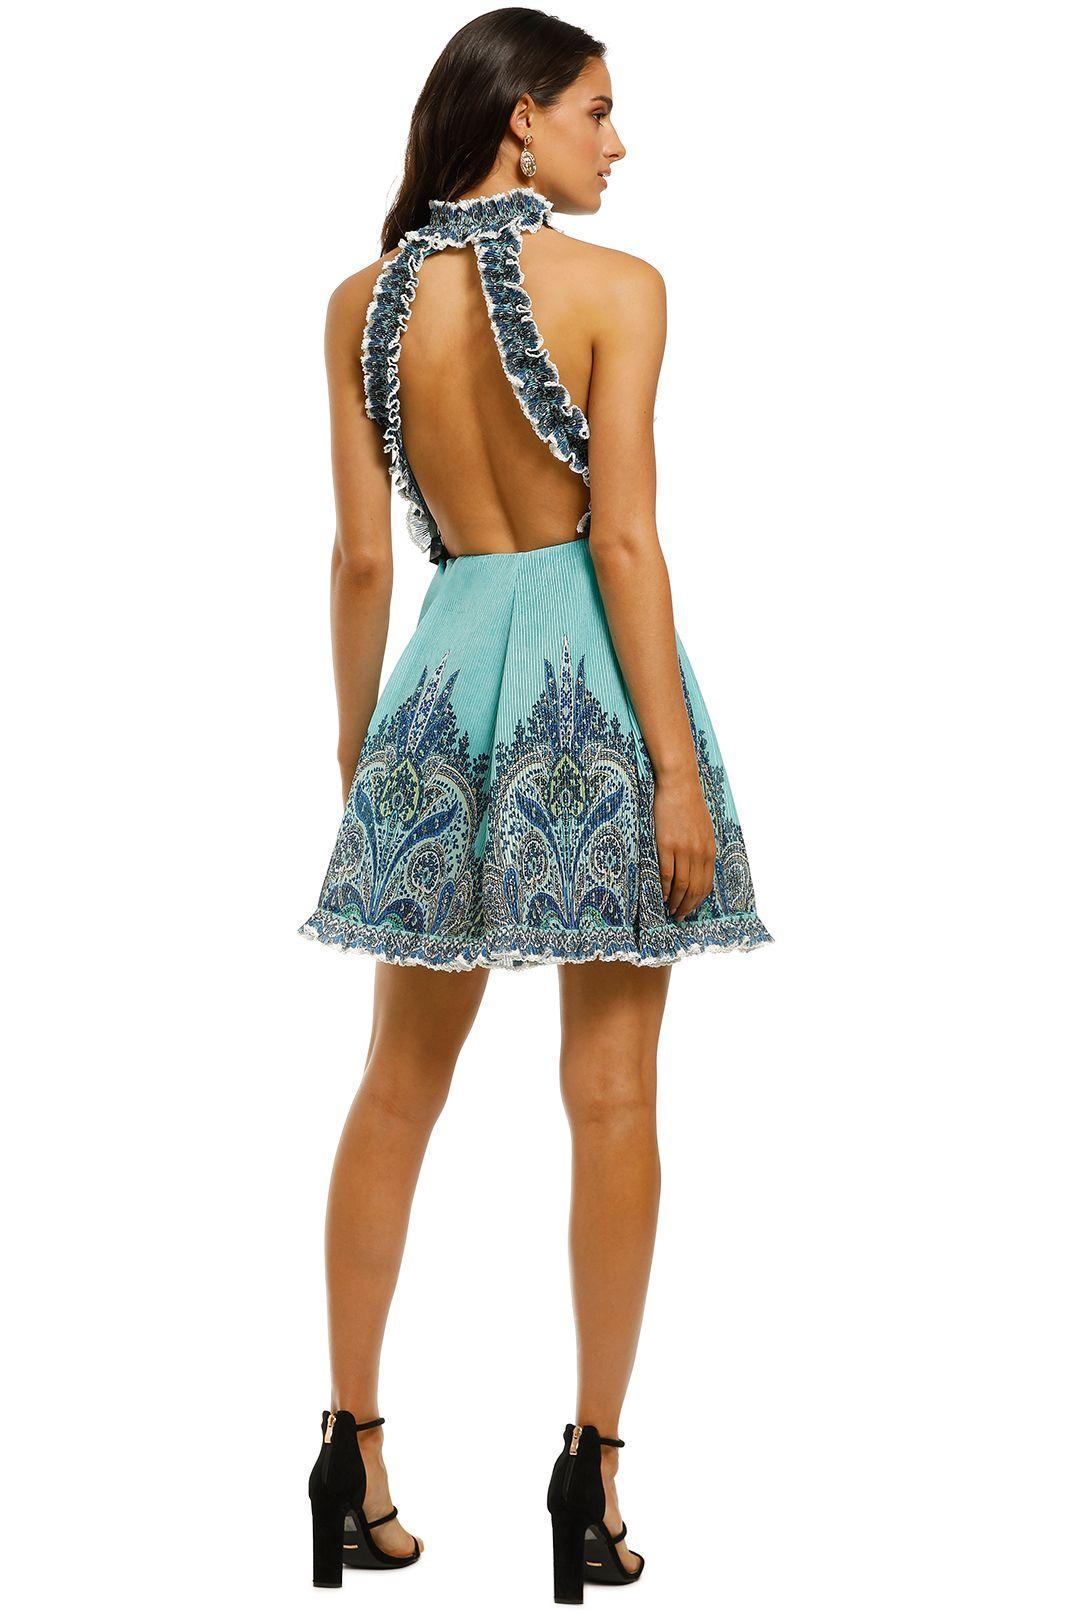 Zimmermann-Moncur-Ruffle-Neck-Mini-Dress-Aqua-Paisley-Back